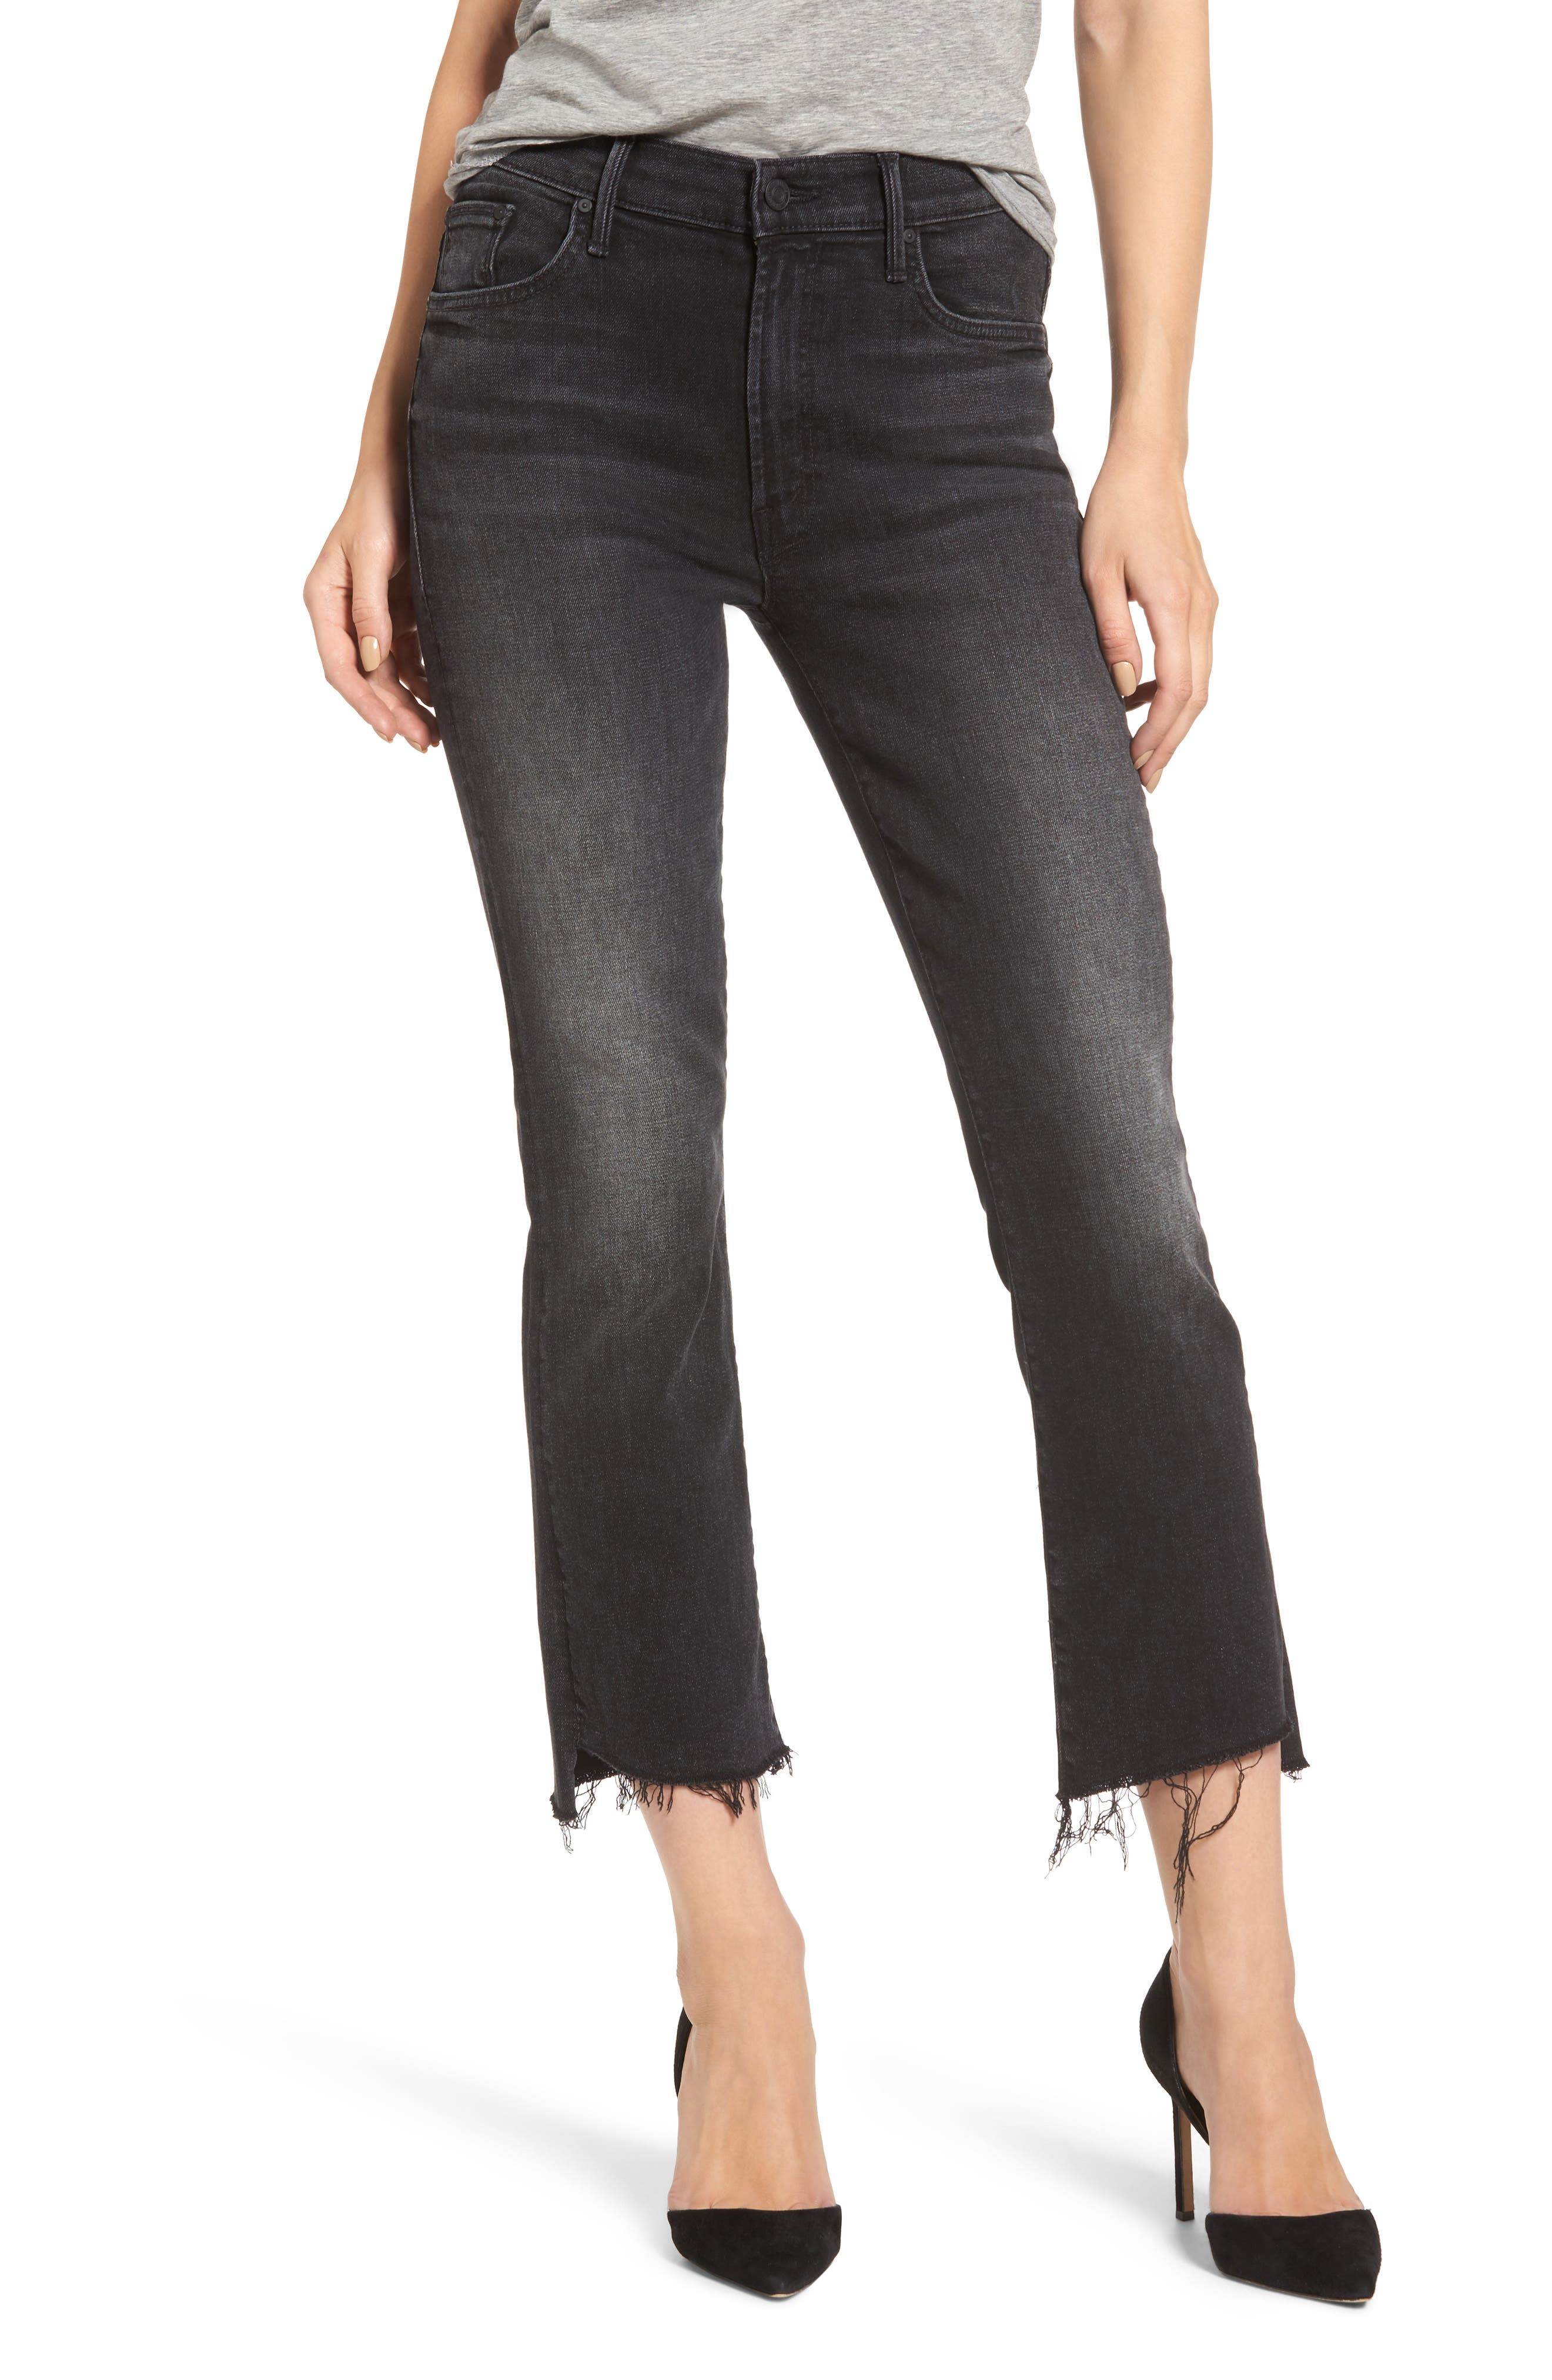 Main Image - MOTHER The Insider High Waist Step Hem Crop Bootcut Jeans (Night Hawk)